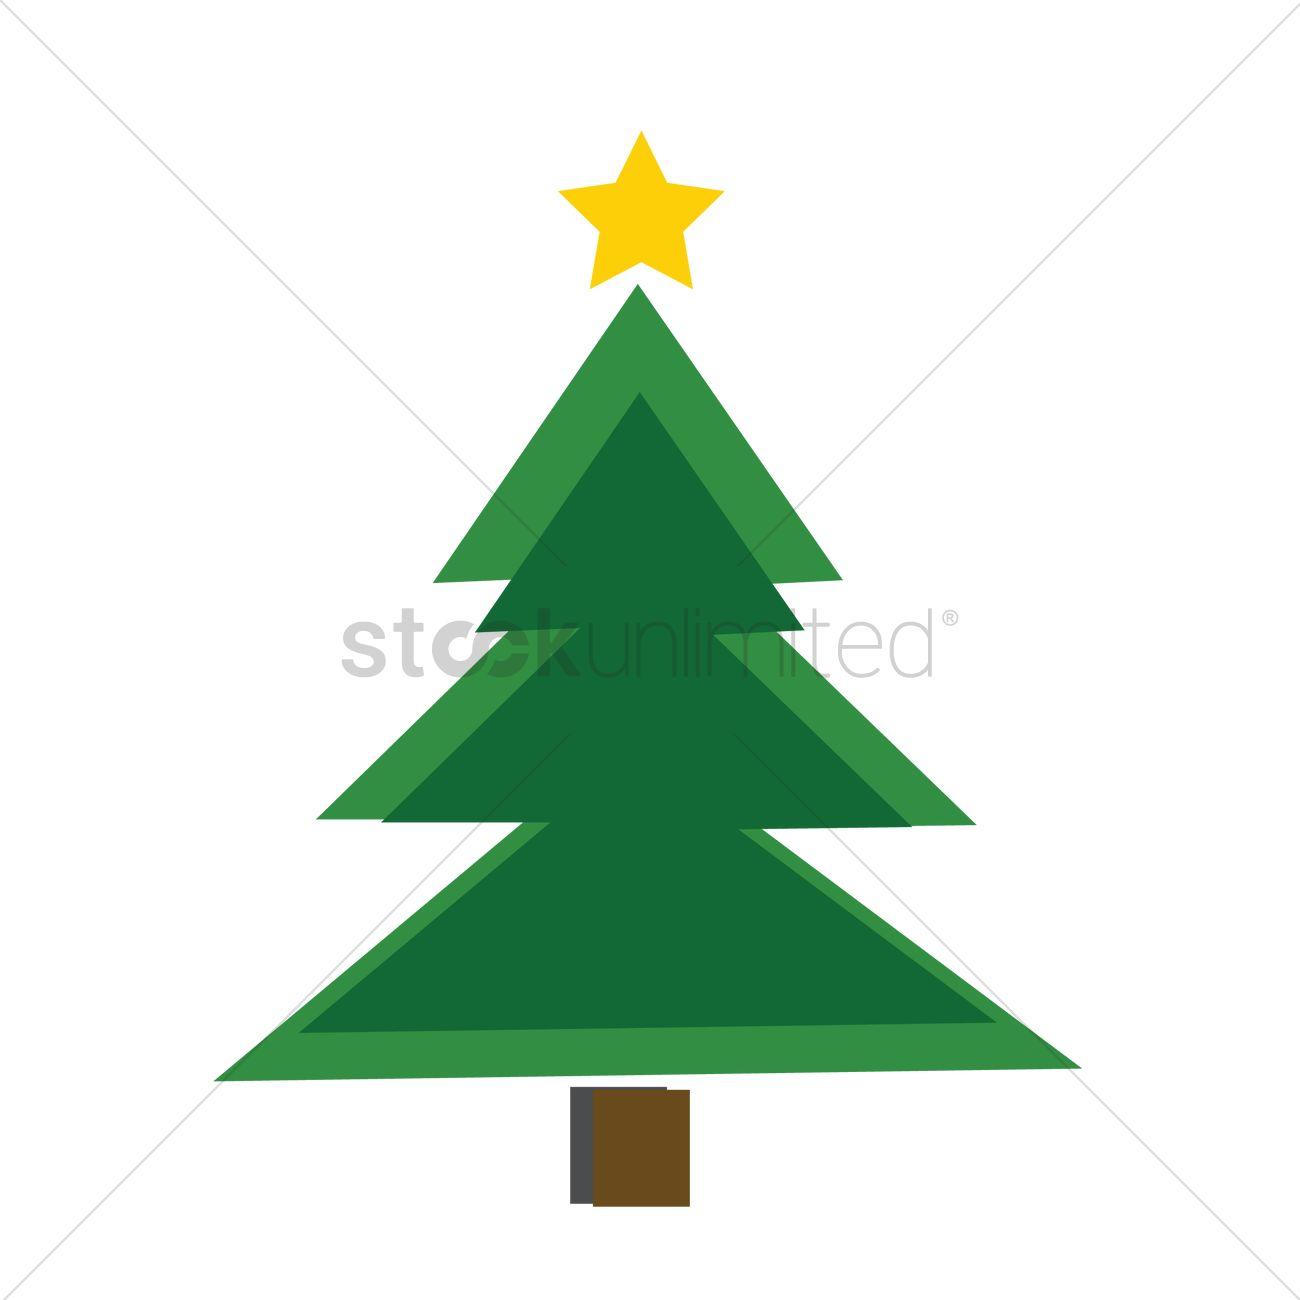 Christmas Tree White Background.Christmas Tree On White Background Vector Image 1237018